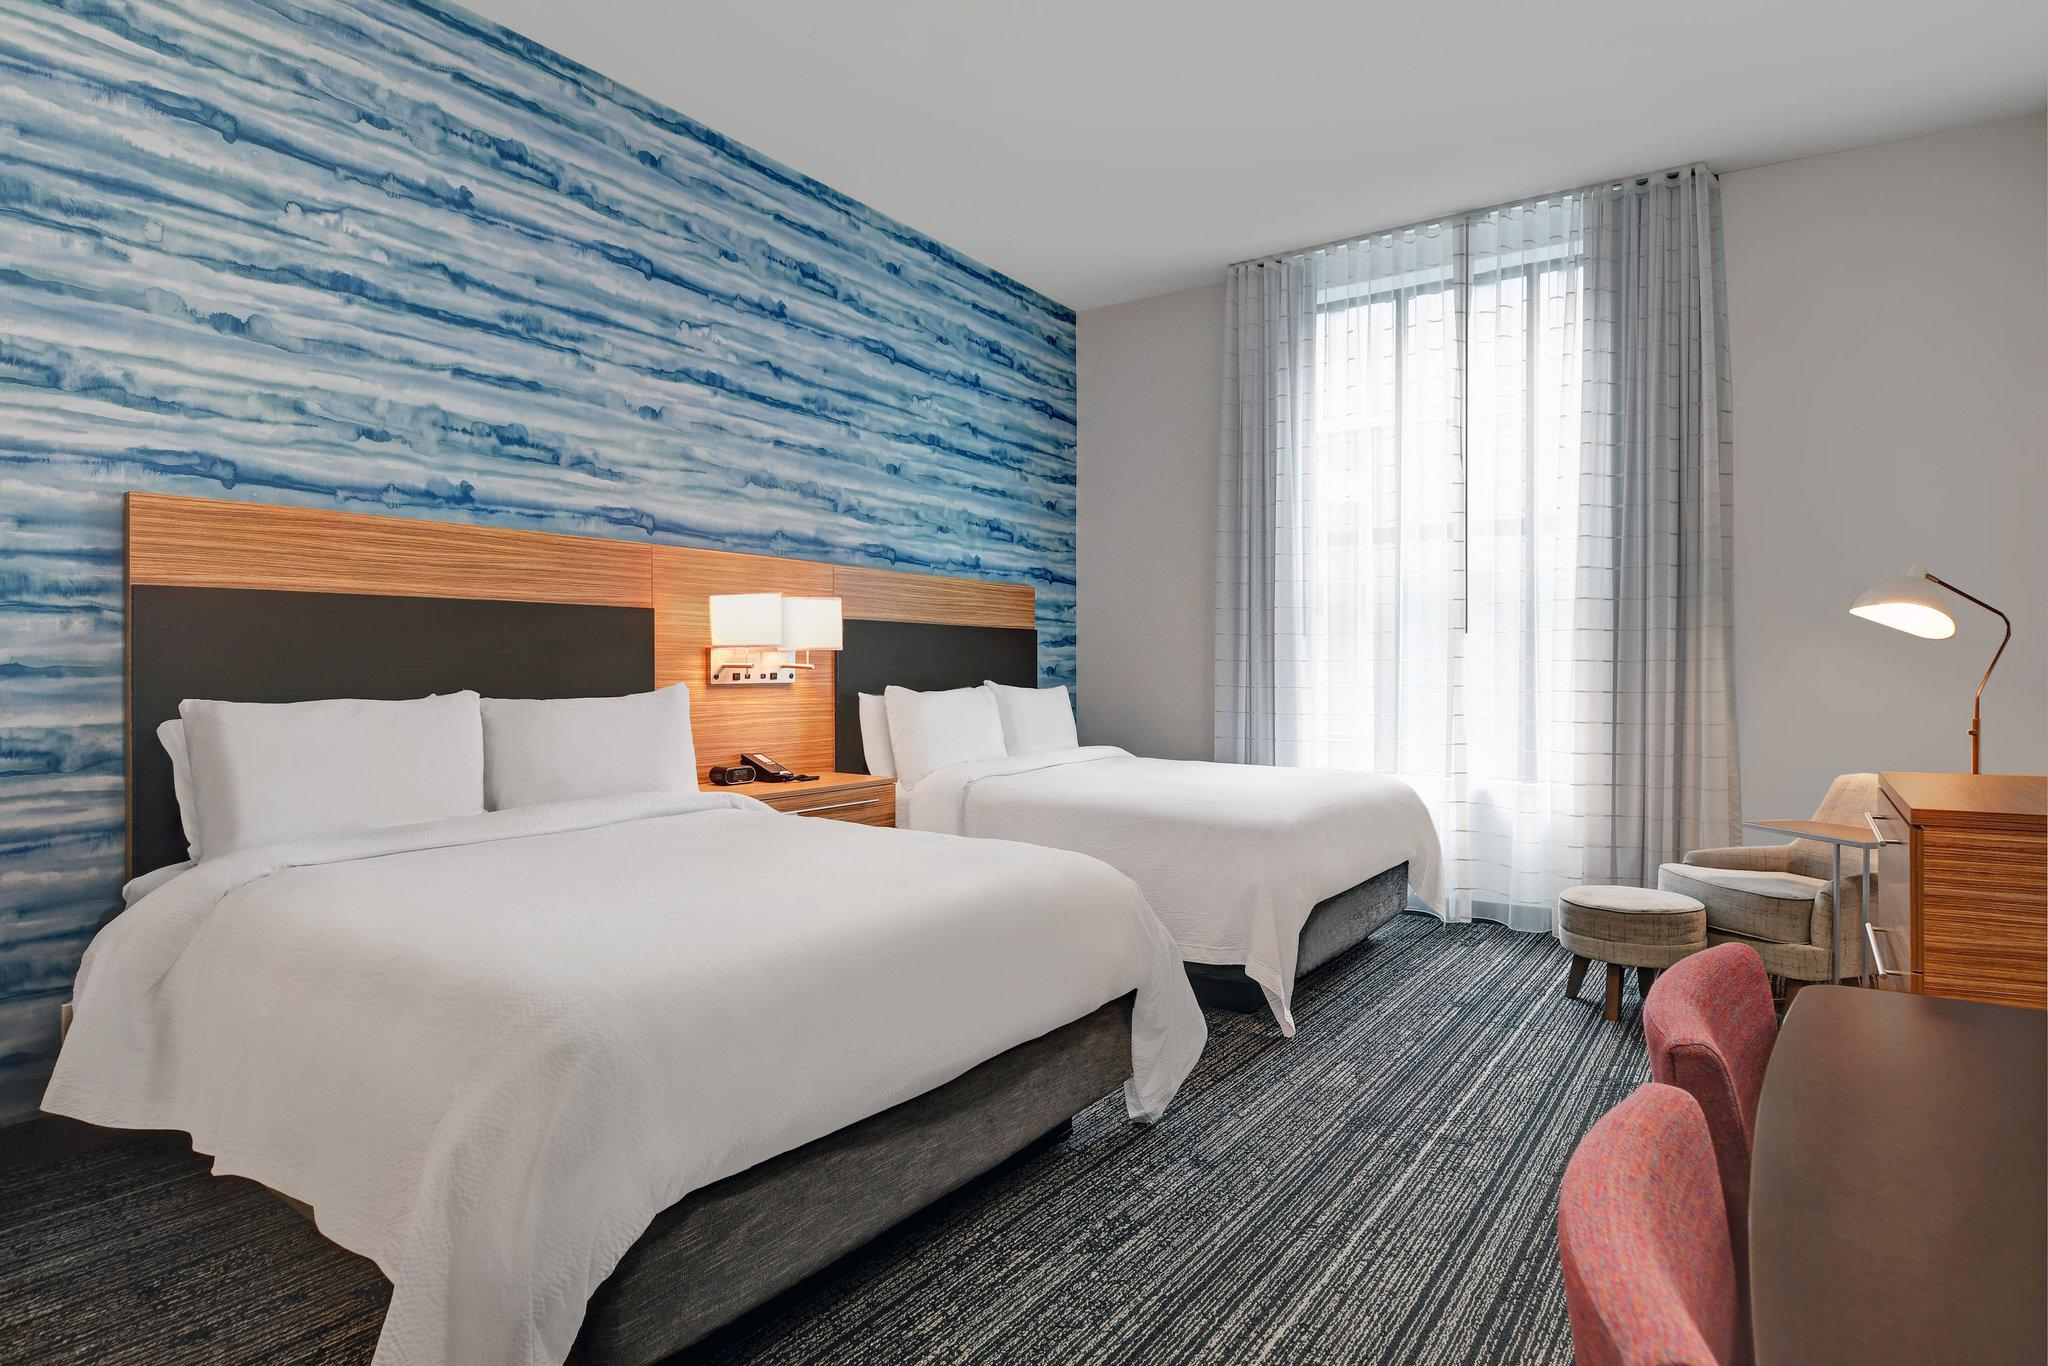 TownePlace Suites by Marriott Cincinnati Downtown